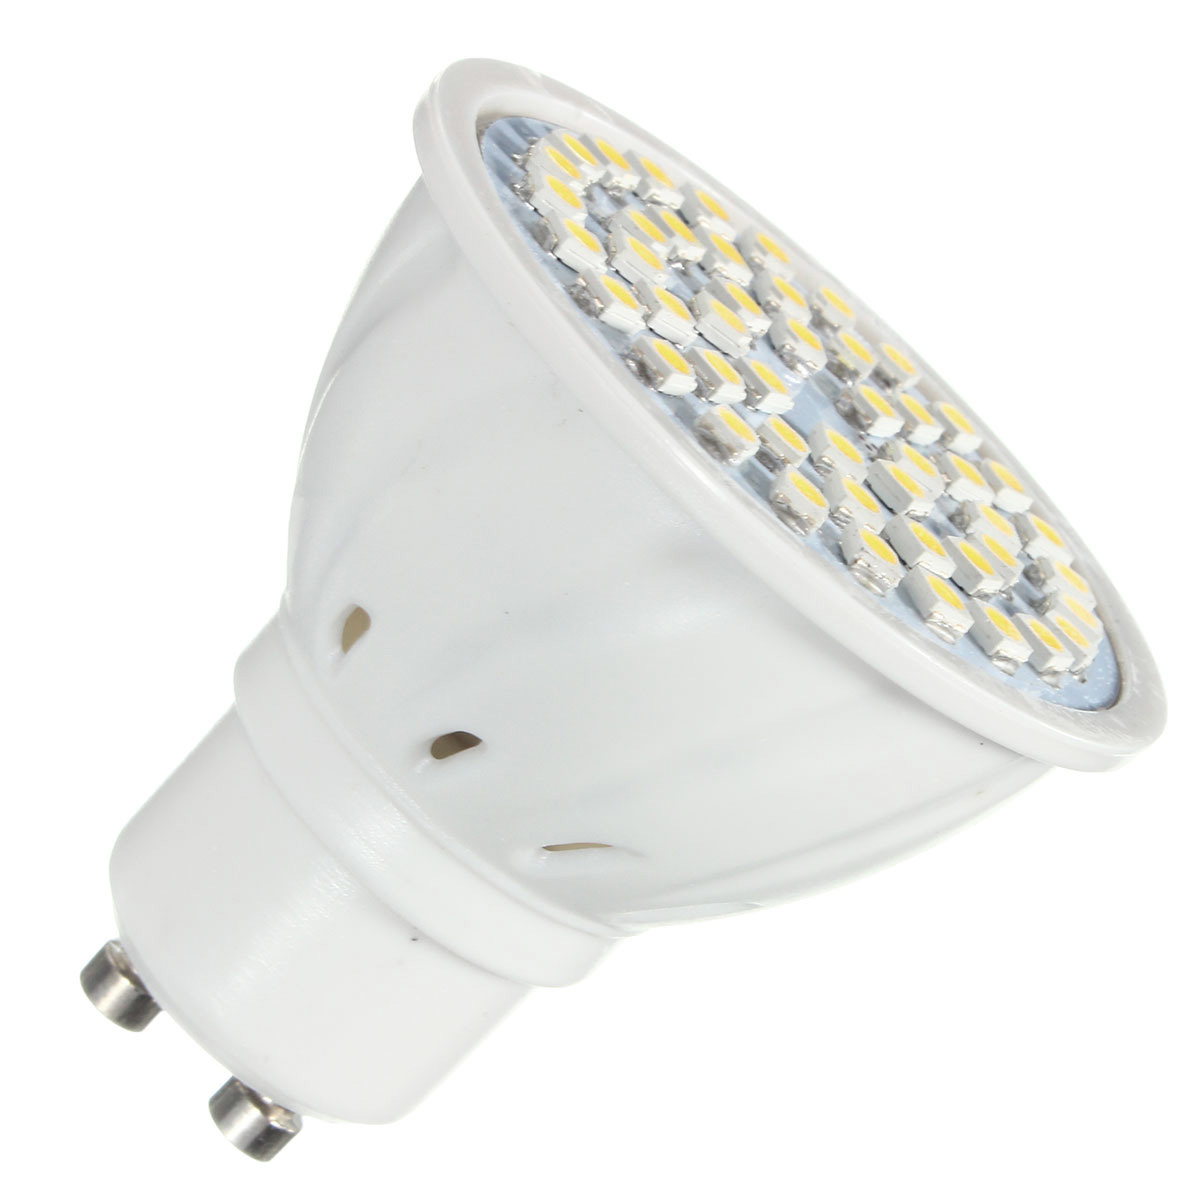 zx e27 e14 gu10 mr16 led 4w 48 smd 3528 led pure white warm white spot light lamp bulb ac110v. Black Bedroom Furniture Sets. Home Design Ideas